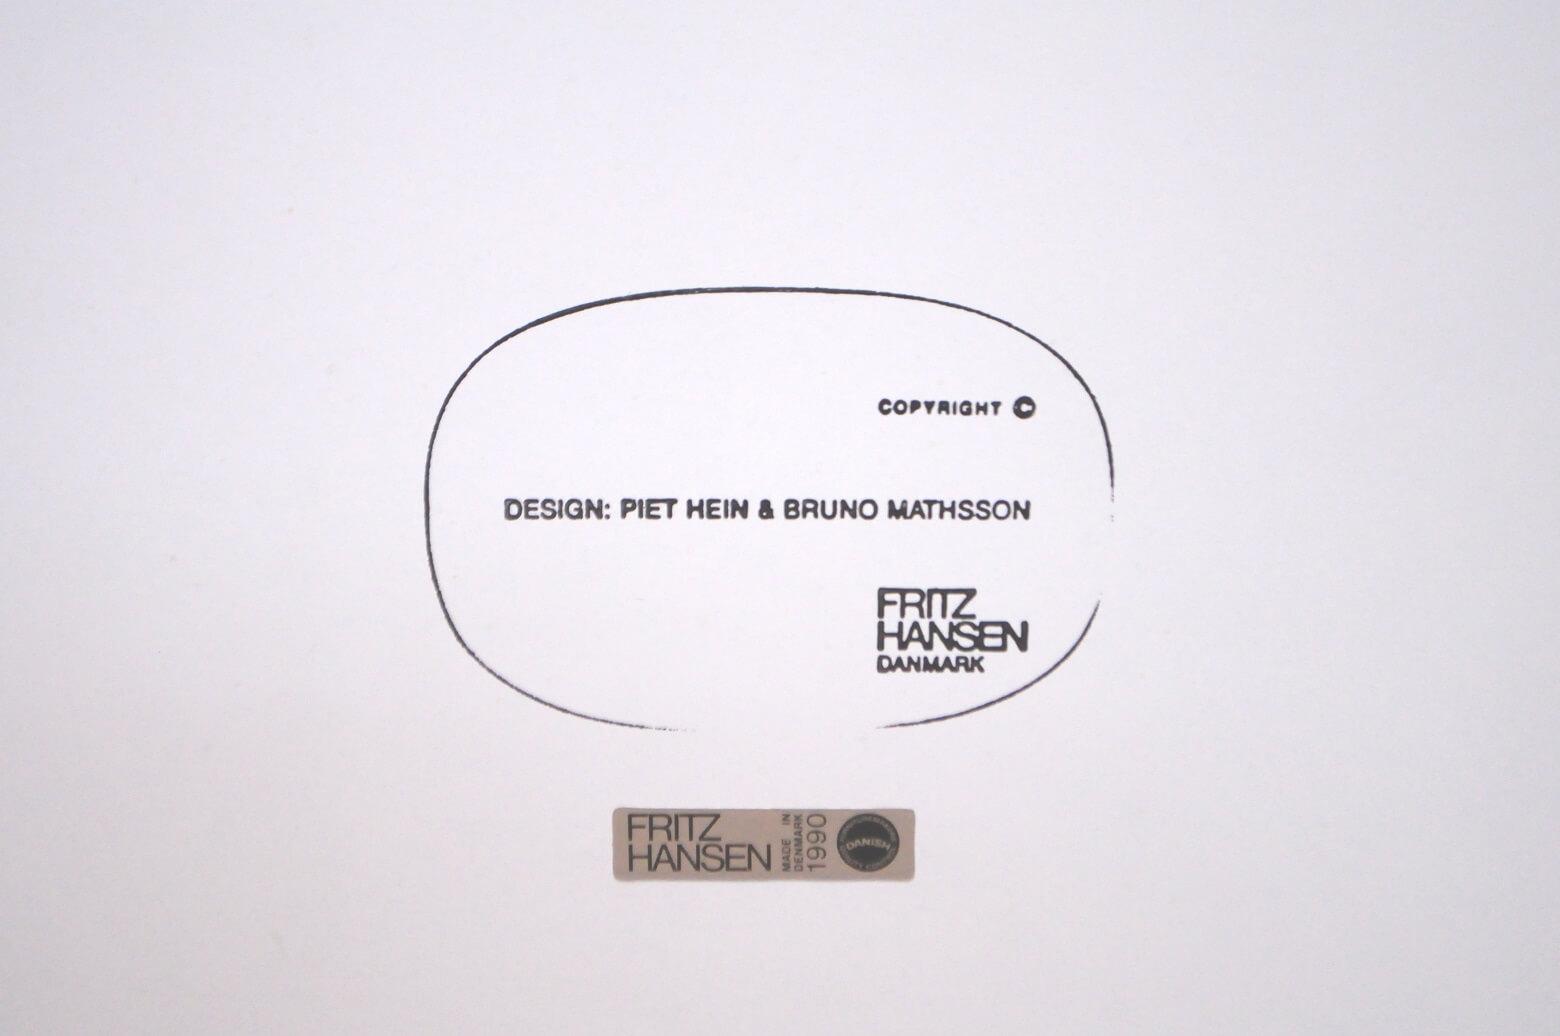 FRITZ HANSEN B TABLE WHITE COLOR DESIGN BY Piet Hein / フリッツハンセン スーパー楕円テーブル ホワイト ピート ハイン デザイン